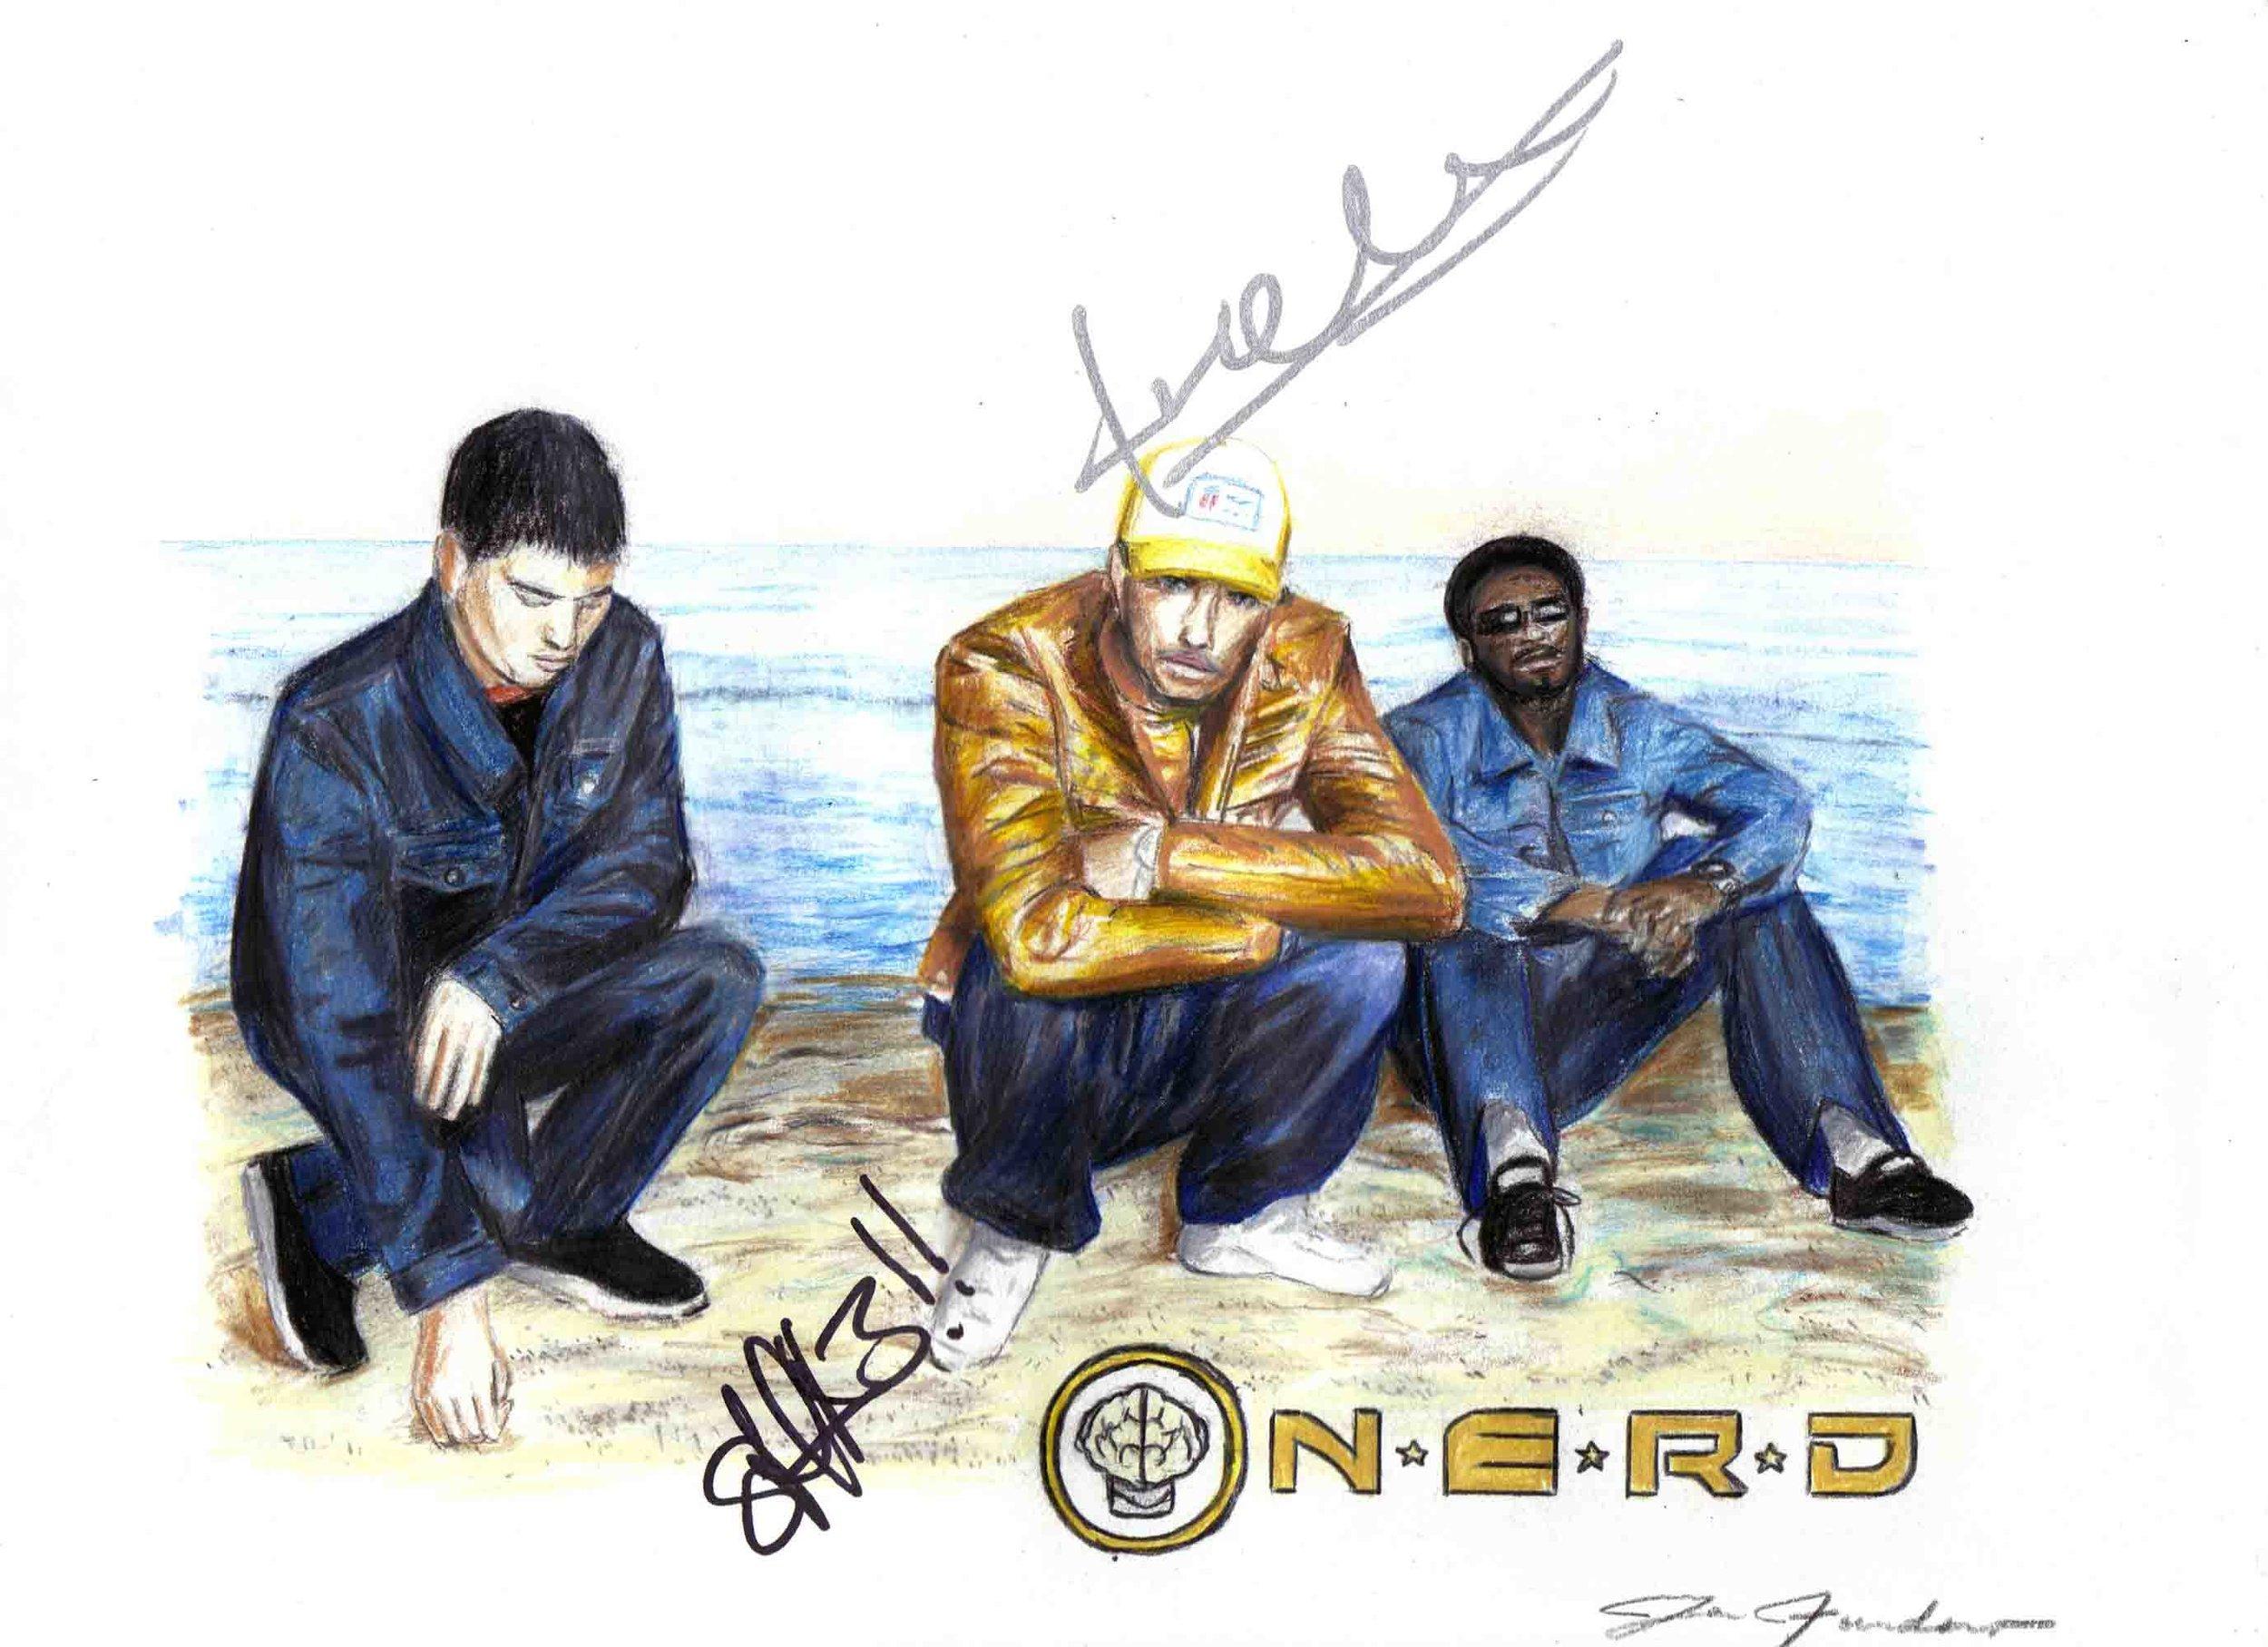 N.E.R.D. (autographed by Pharrell WIlliams & Shae Haley)